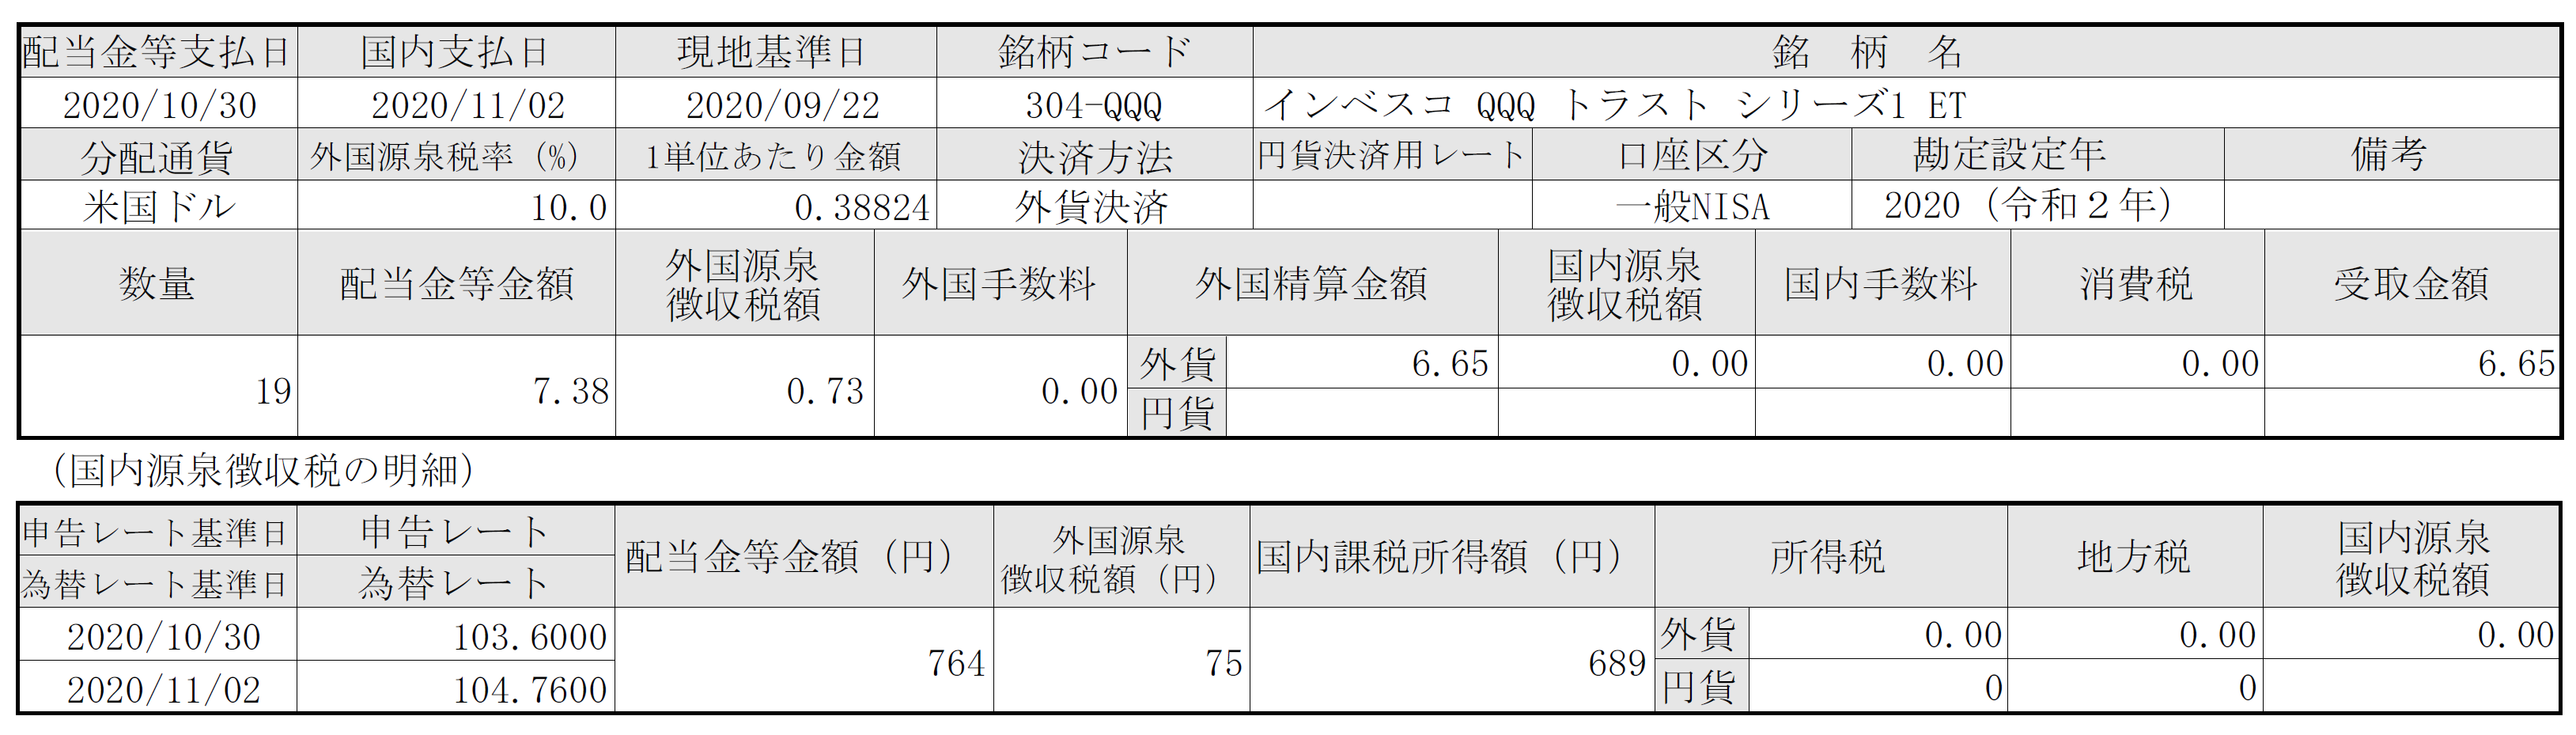 f:id:hodo-work:20201110193407p:plain